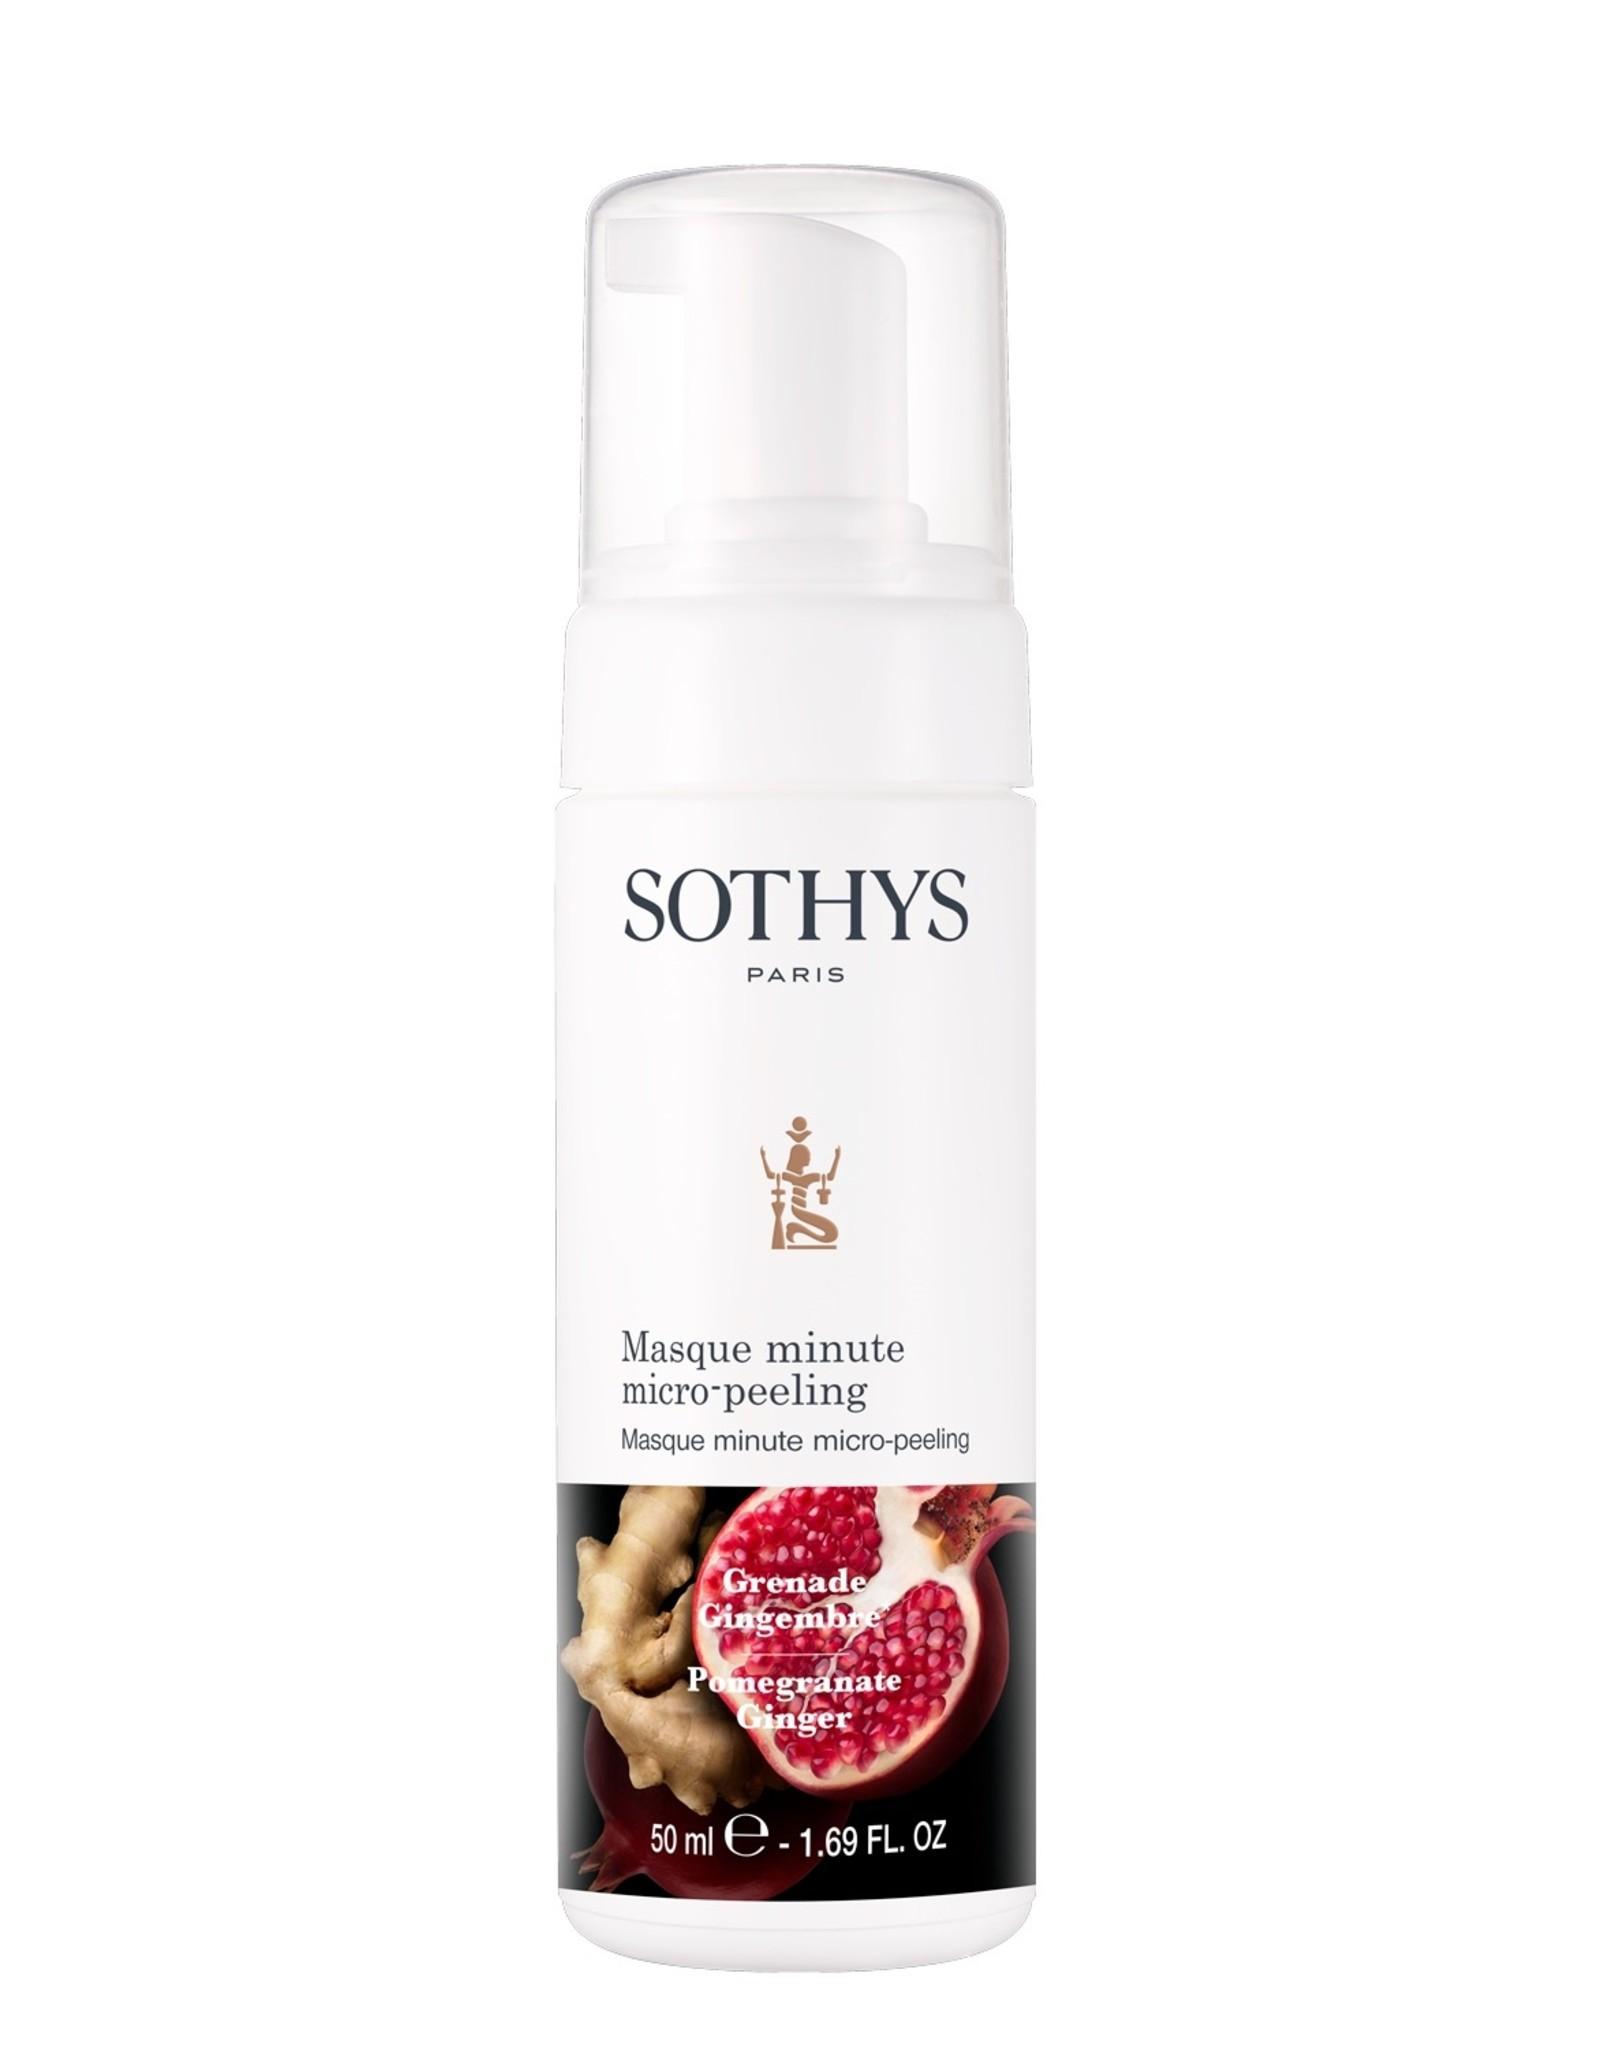 SOTHYS Express micro-peeling mask - Sothys